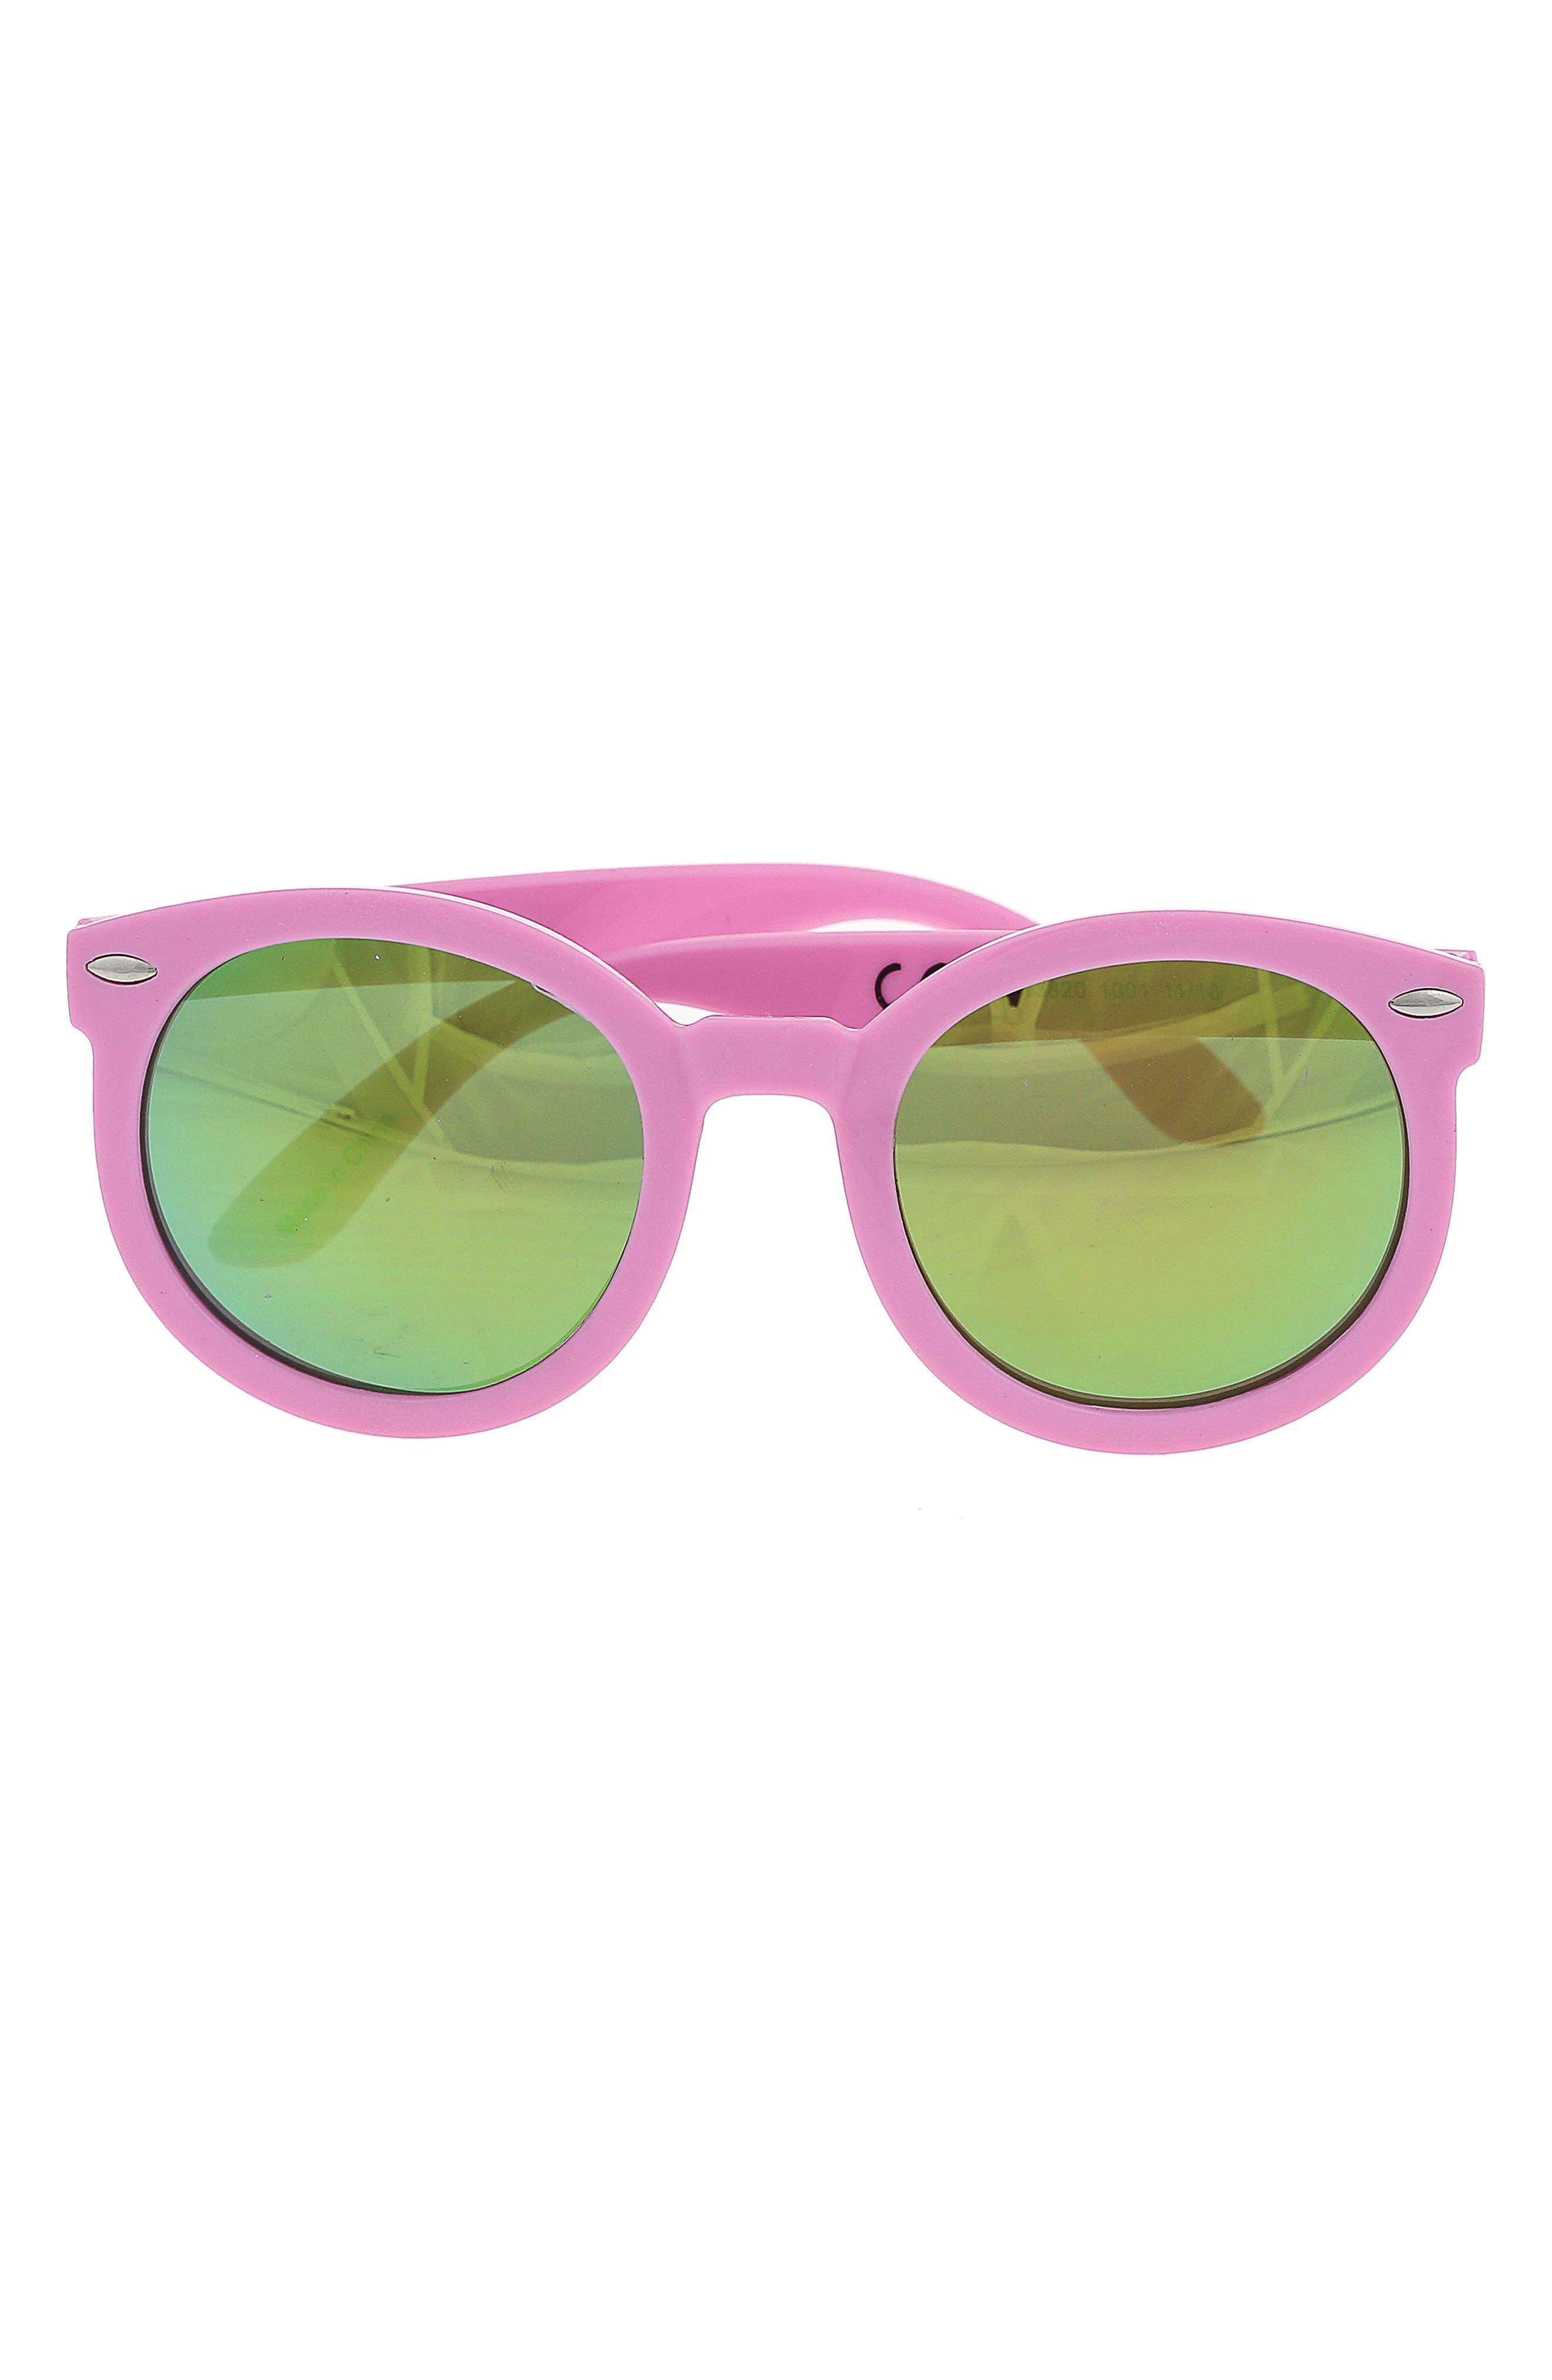 Girls Capelli New York Summer Sunglasses  Icon Print Case Set  Multi Co